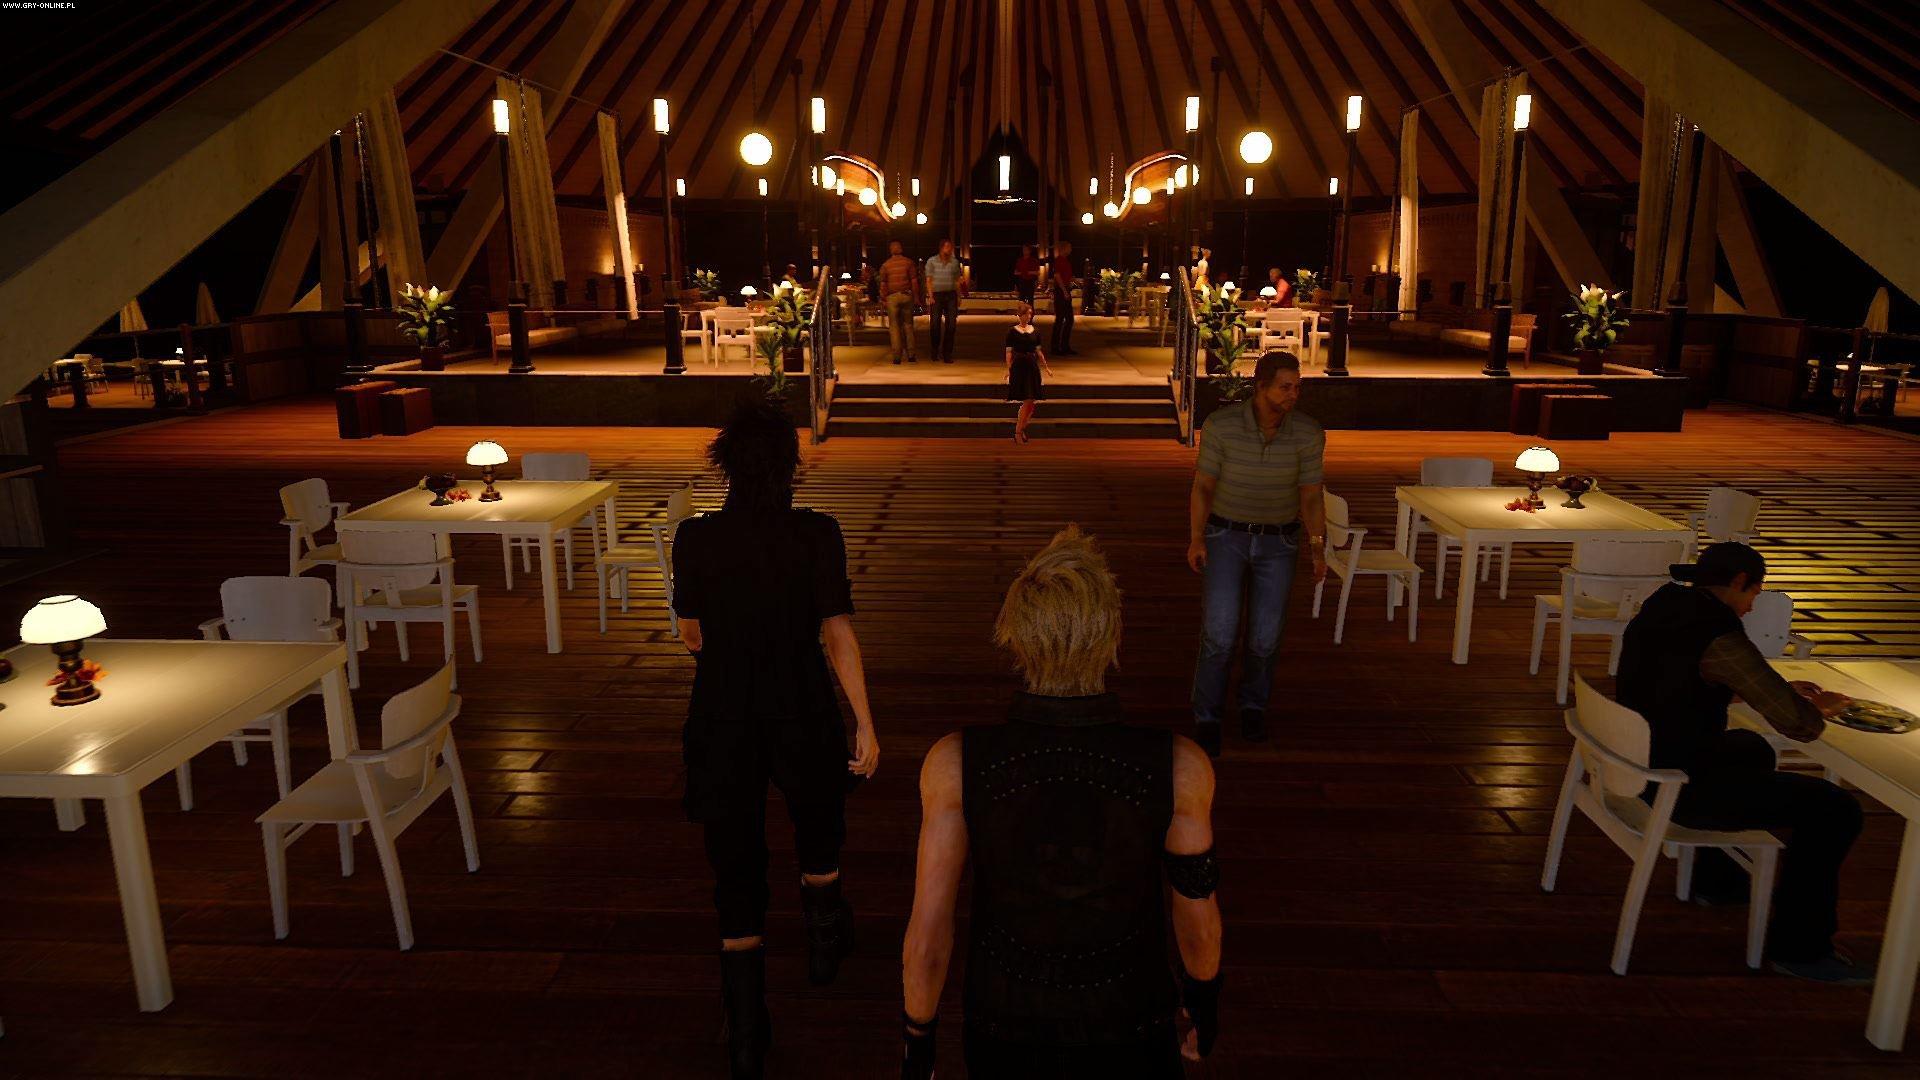 Final Fantasy XV PS4, XONE Games Image 110/308, Square-Enix, Square-Enix / Eidos